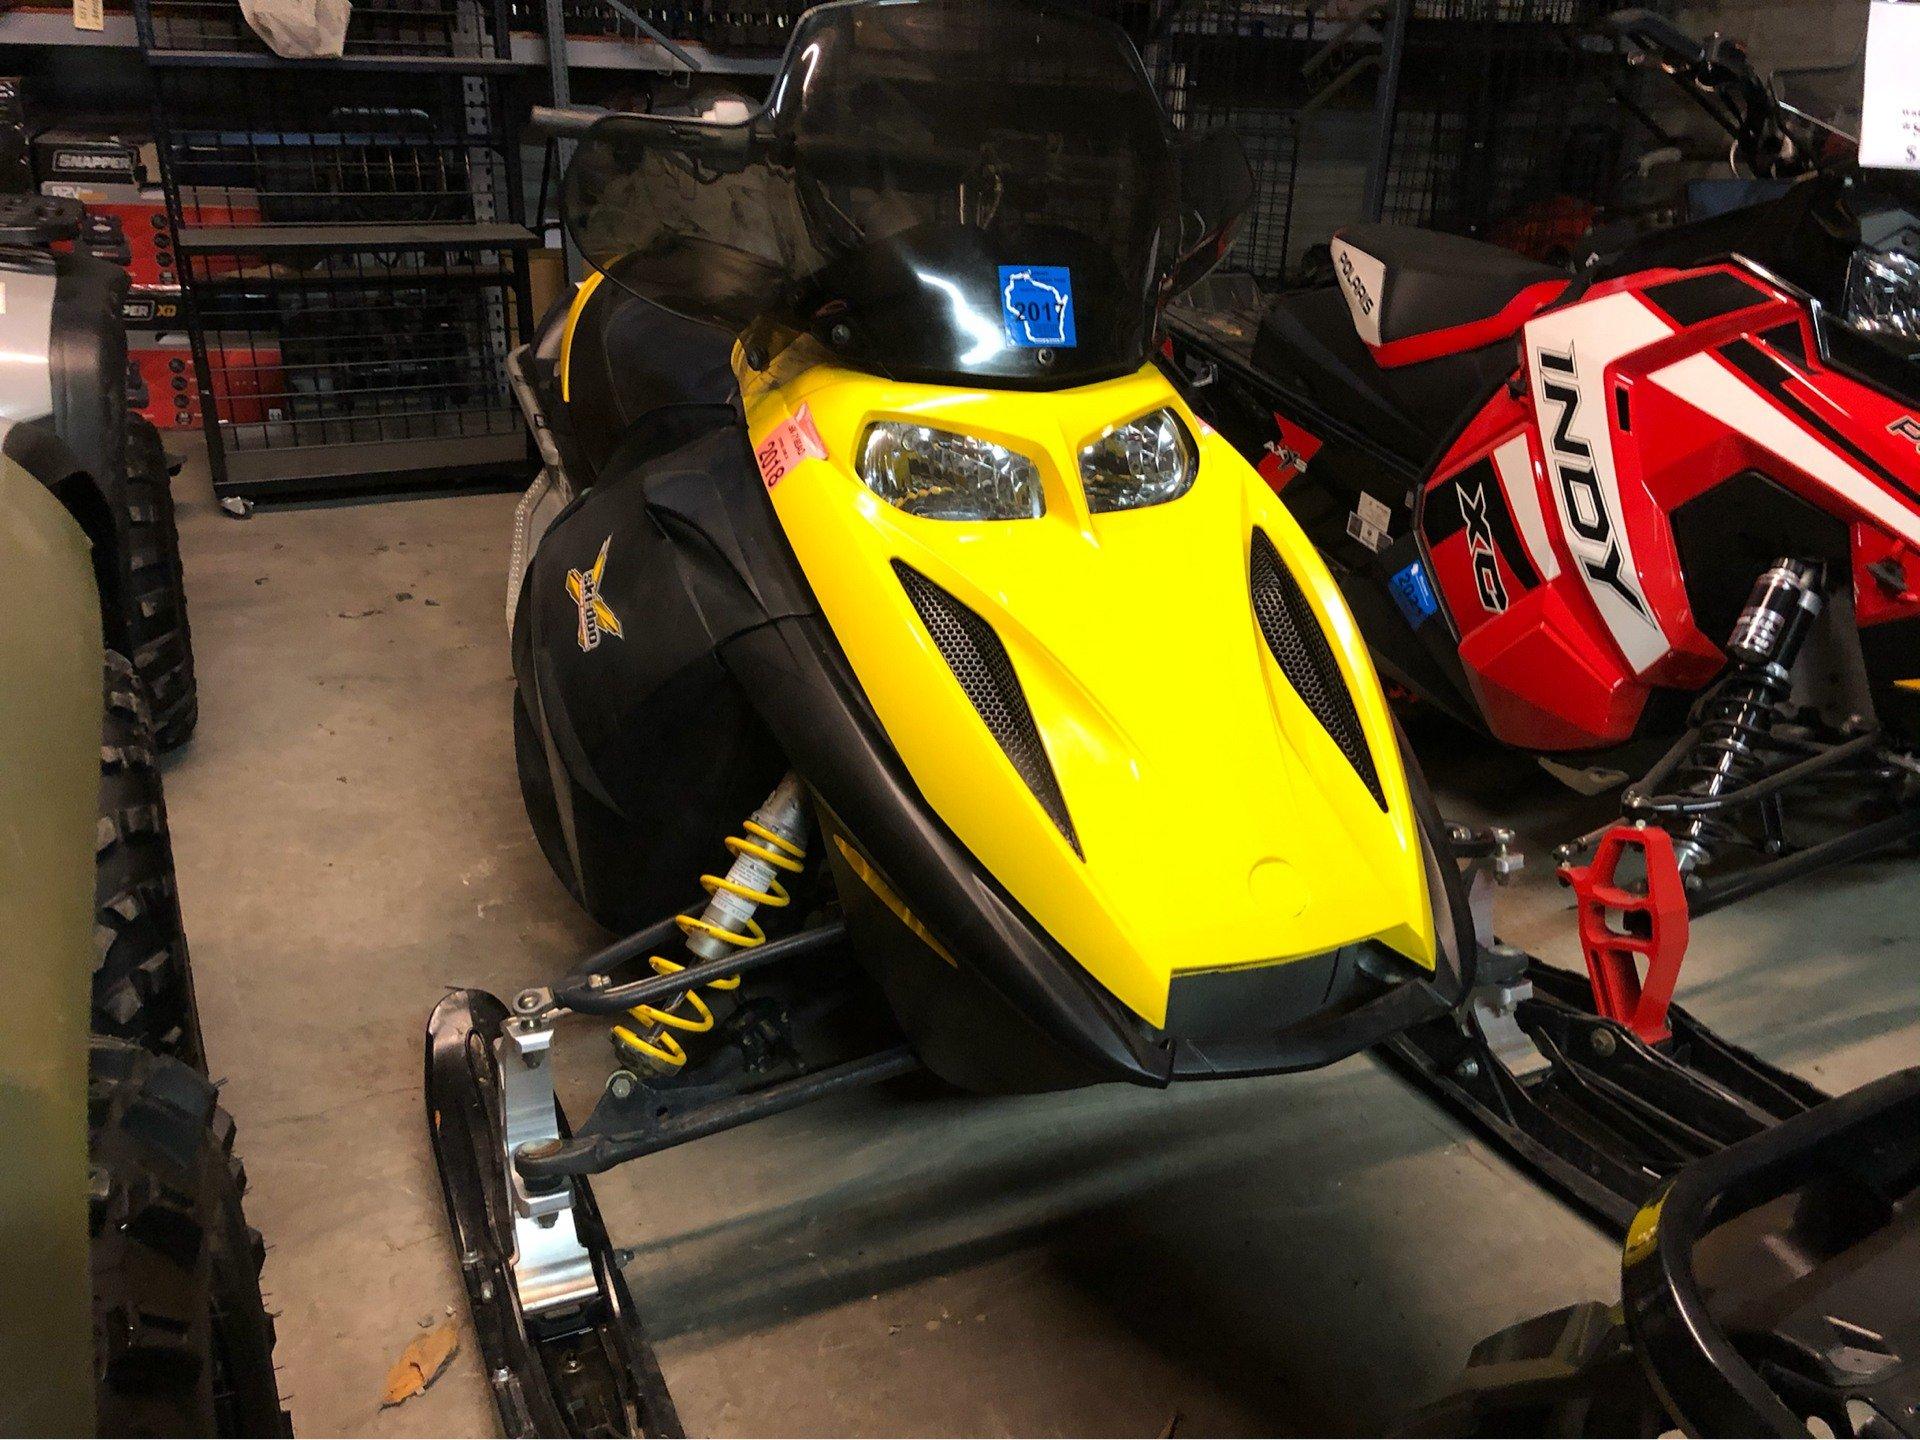 Used 2007 Ski Doo Mx Z Adrenaline 2 Tec 600 H O Sdi Snowmobiles In Fond Du Lac Wi Stock Number U000326